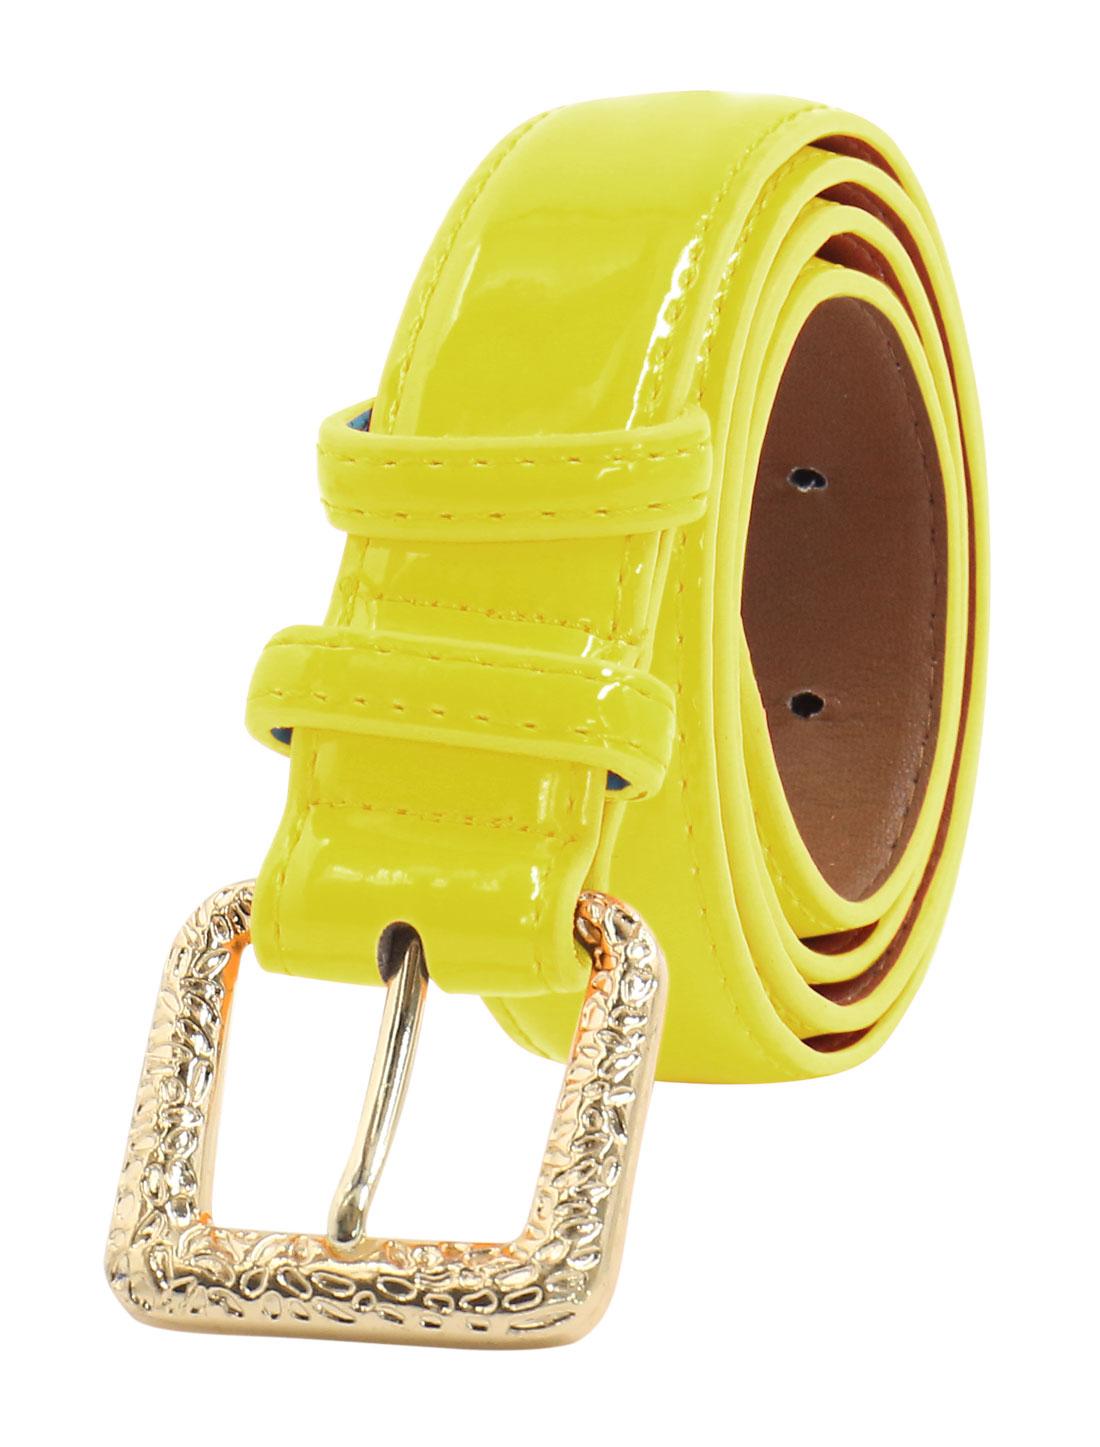 Women Adjustable Single Pin Buckle PU Waist Belt Light Yellow